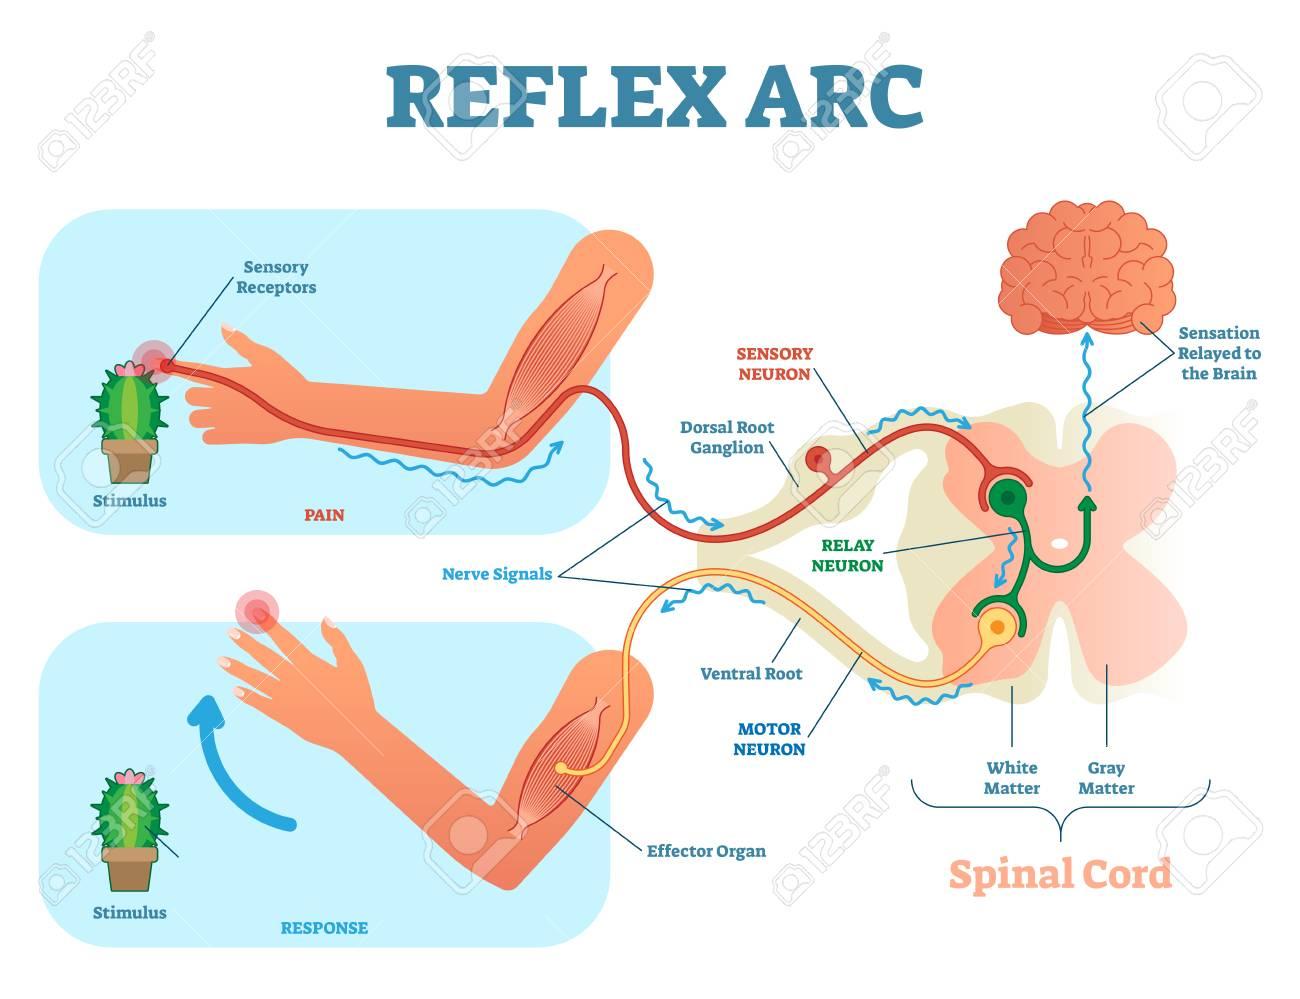 Reflex arc diagram circuit connection diagram spinal reflex arc anatomical scheme vector illustration with rh 123rf com reflex arc diagram class 10 ccuart Image collections